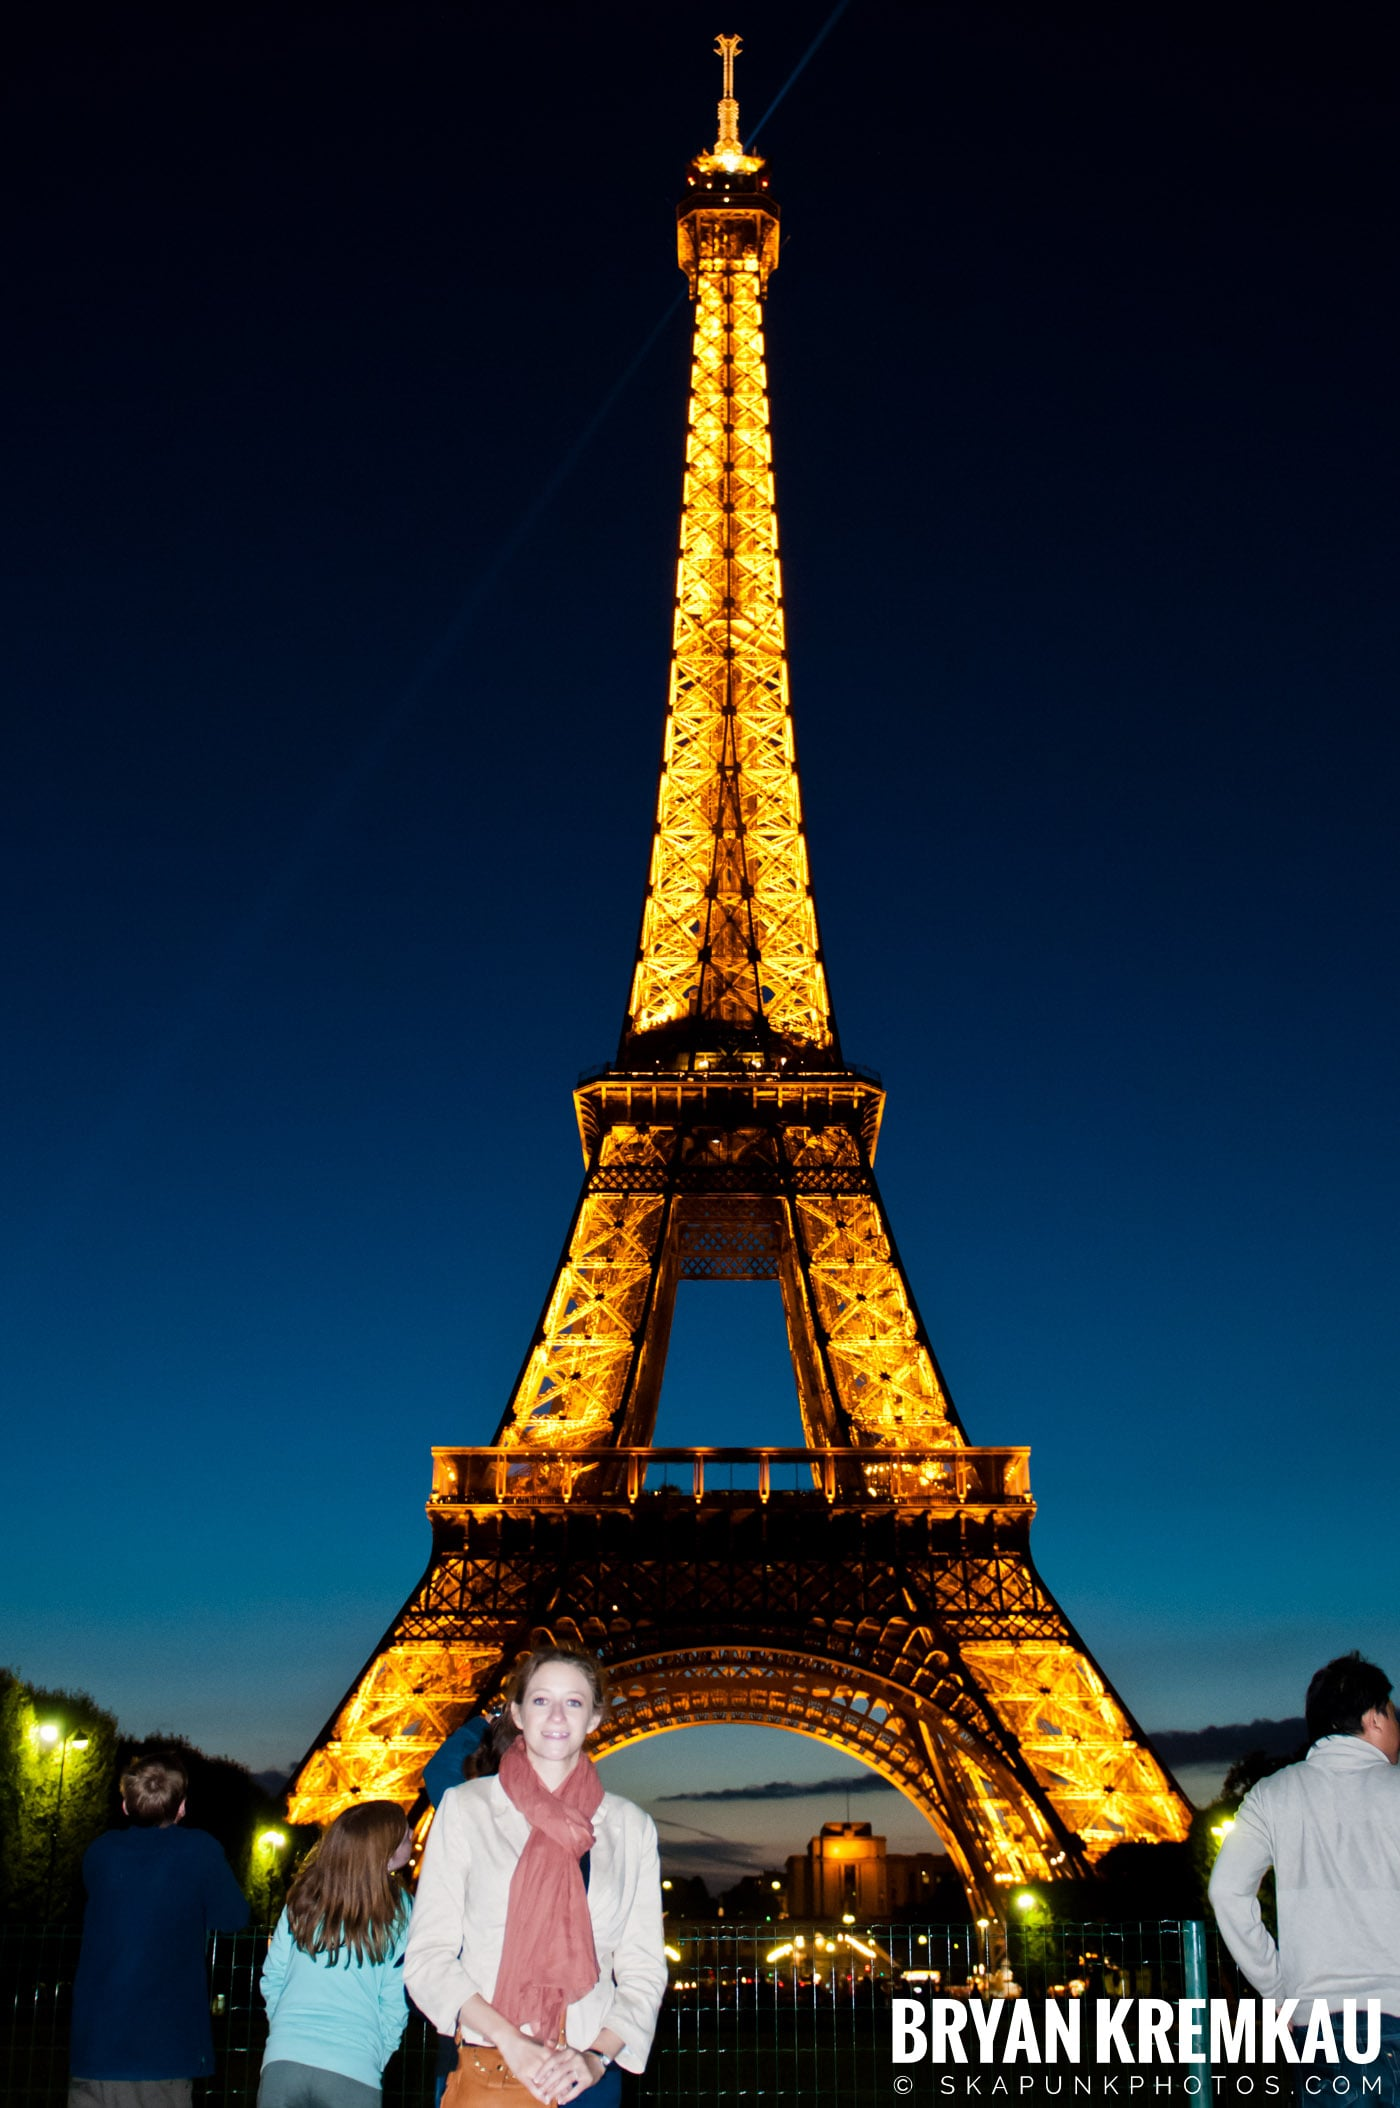 Paris, France Honeymoon - Day 5 - 7.22.11 (15)